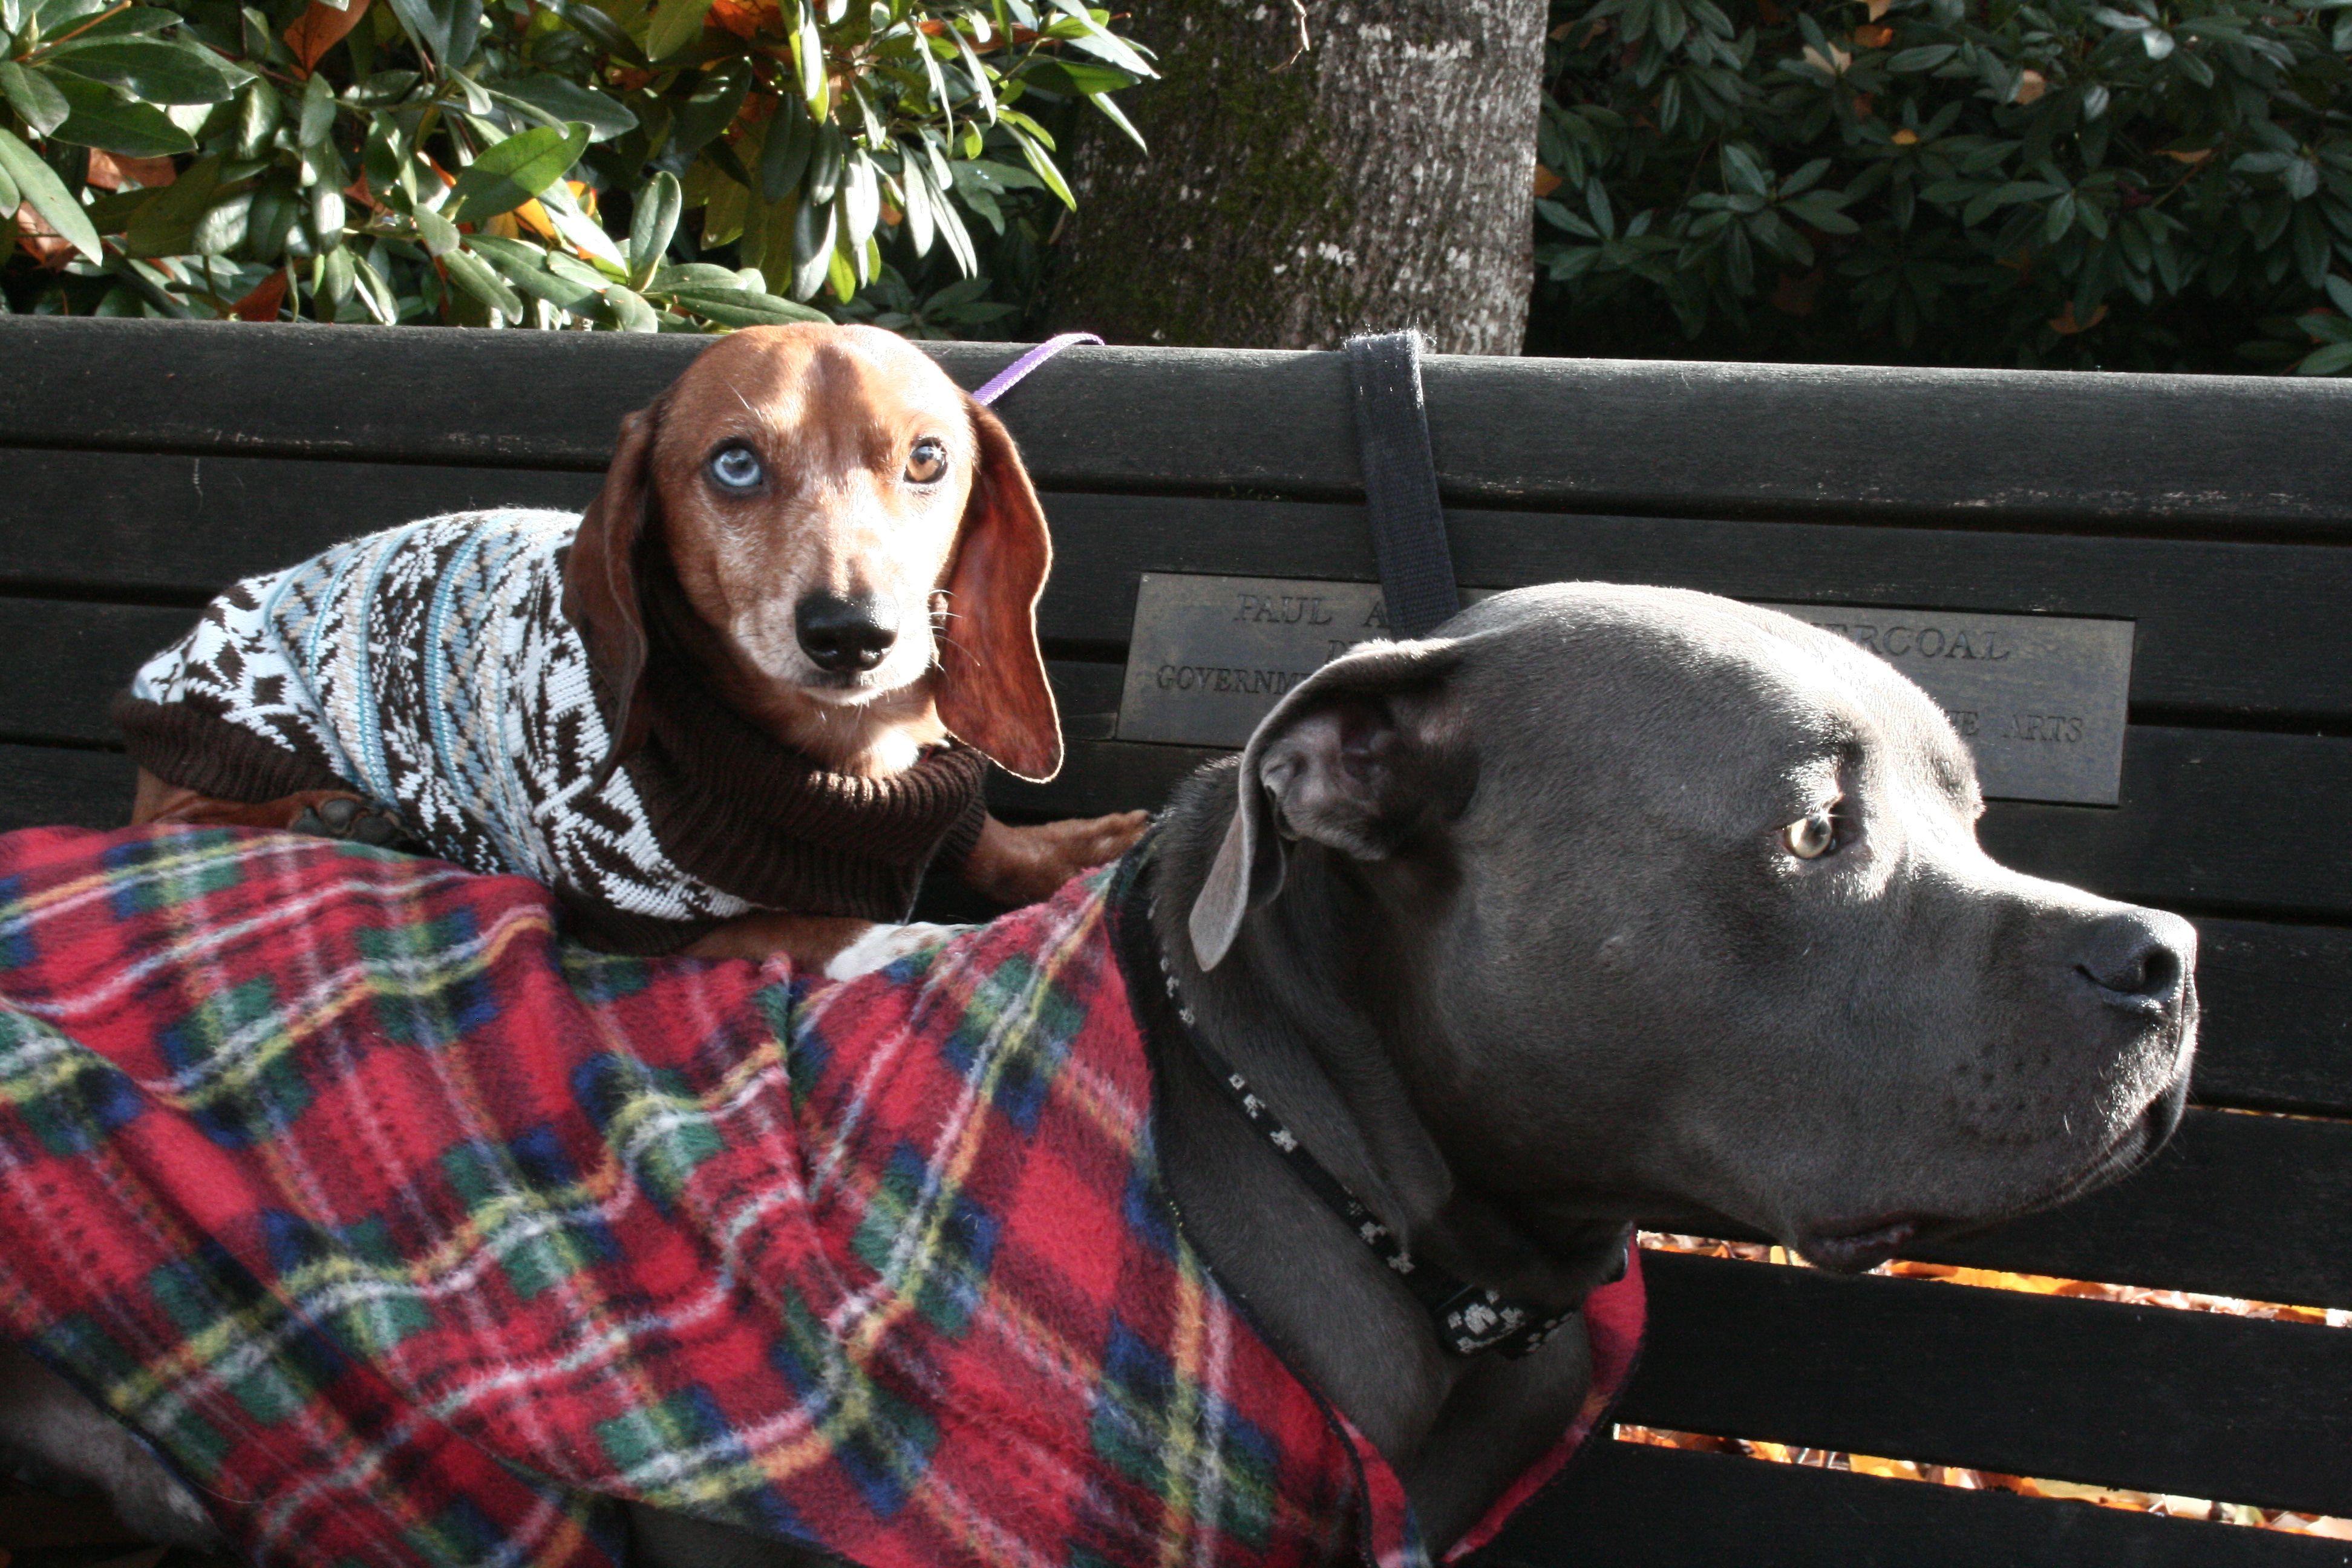 Pitbull And Wiener Dog Best Friends Dog Best Friend Blue Pitbull Pet Clothes